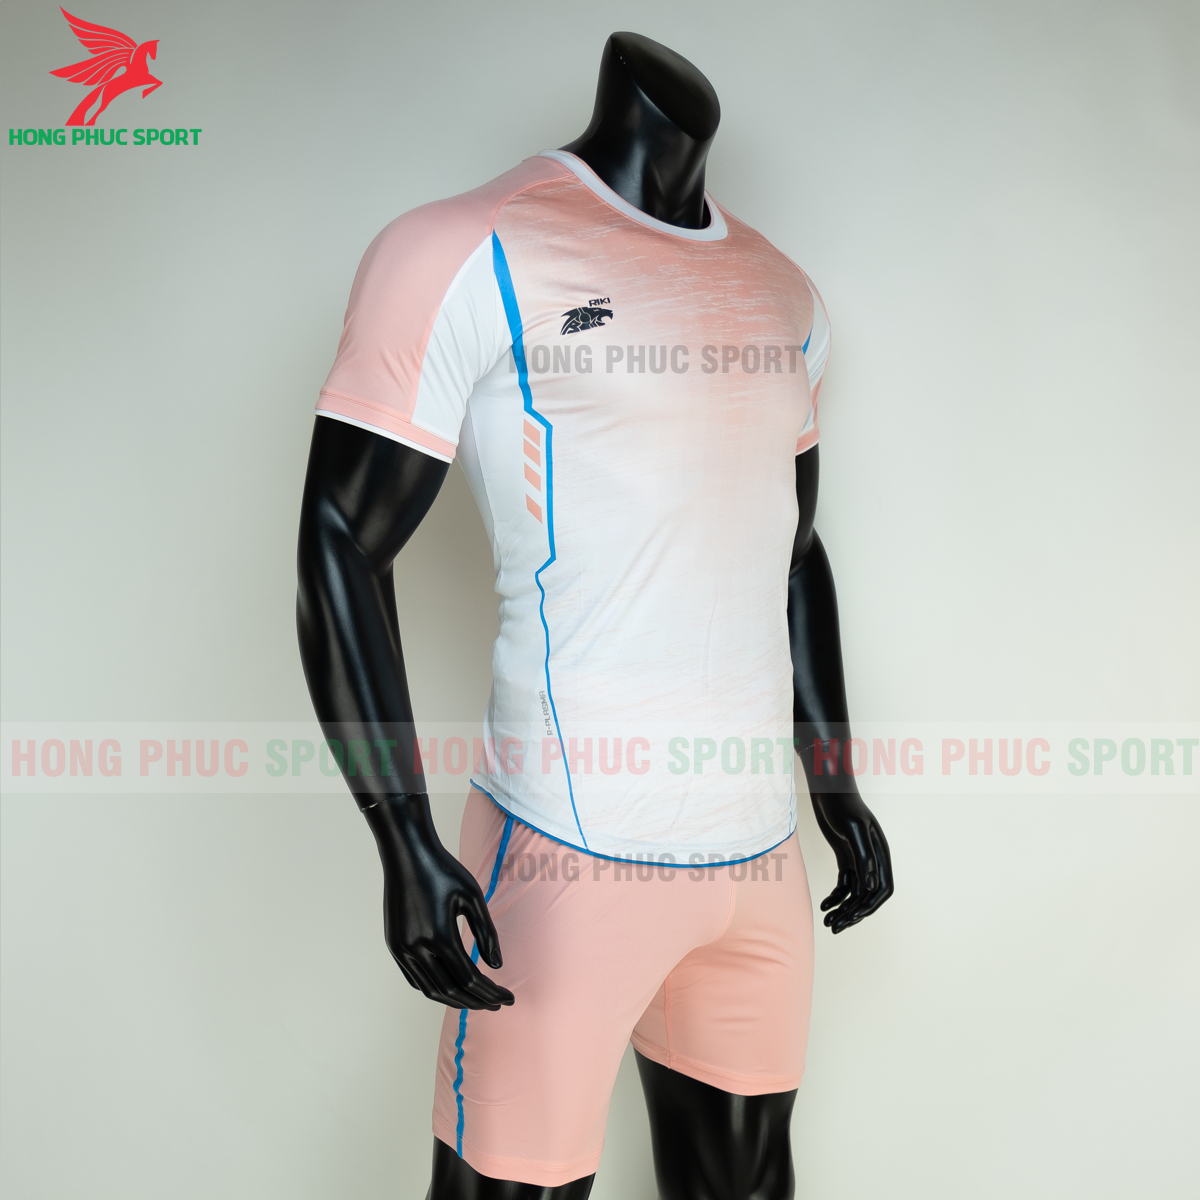 https://cdn.hongphucsport.com/unsafe/s4.shopbay.vn/files/285/ao-bong-da-khong-logo-riki-grambor-mau-hong-6-60506118a0d4b.png